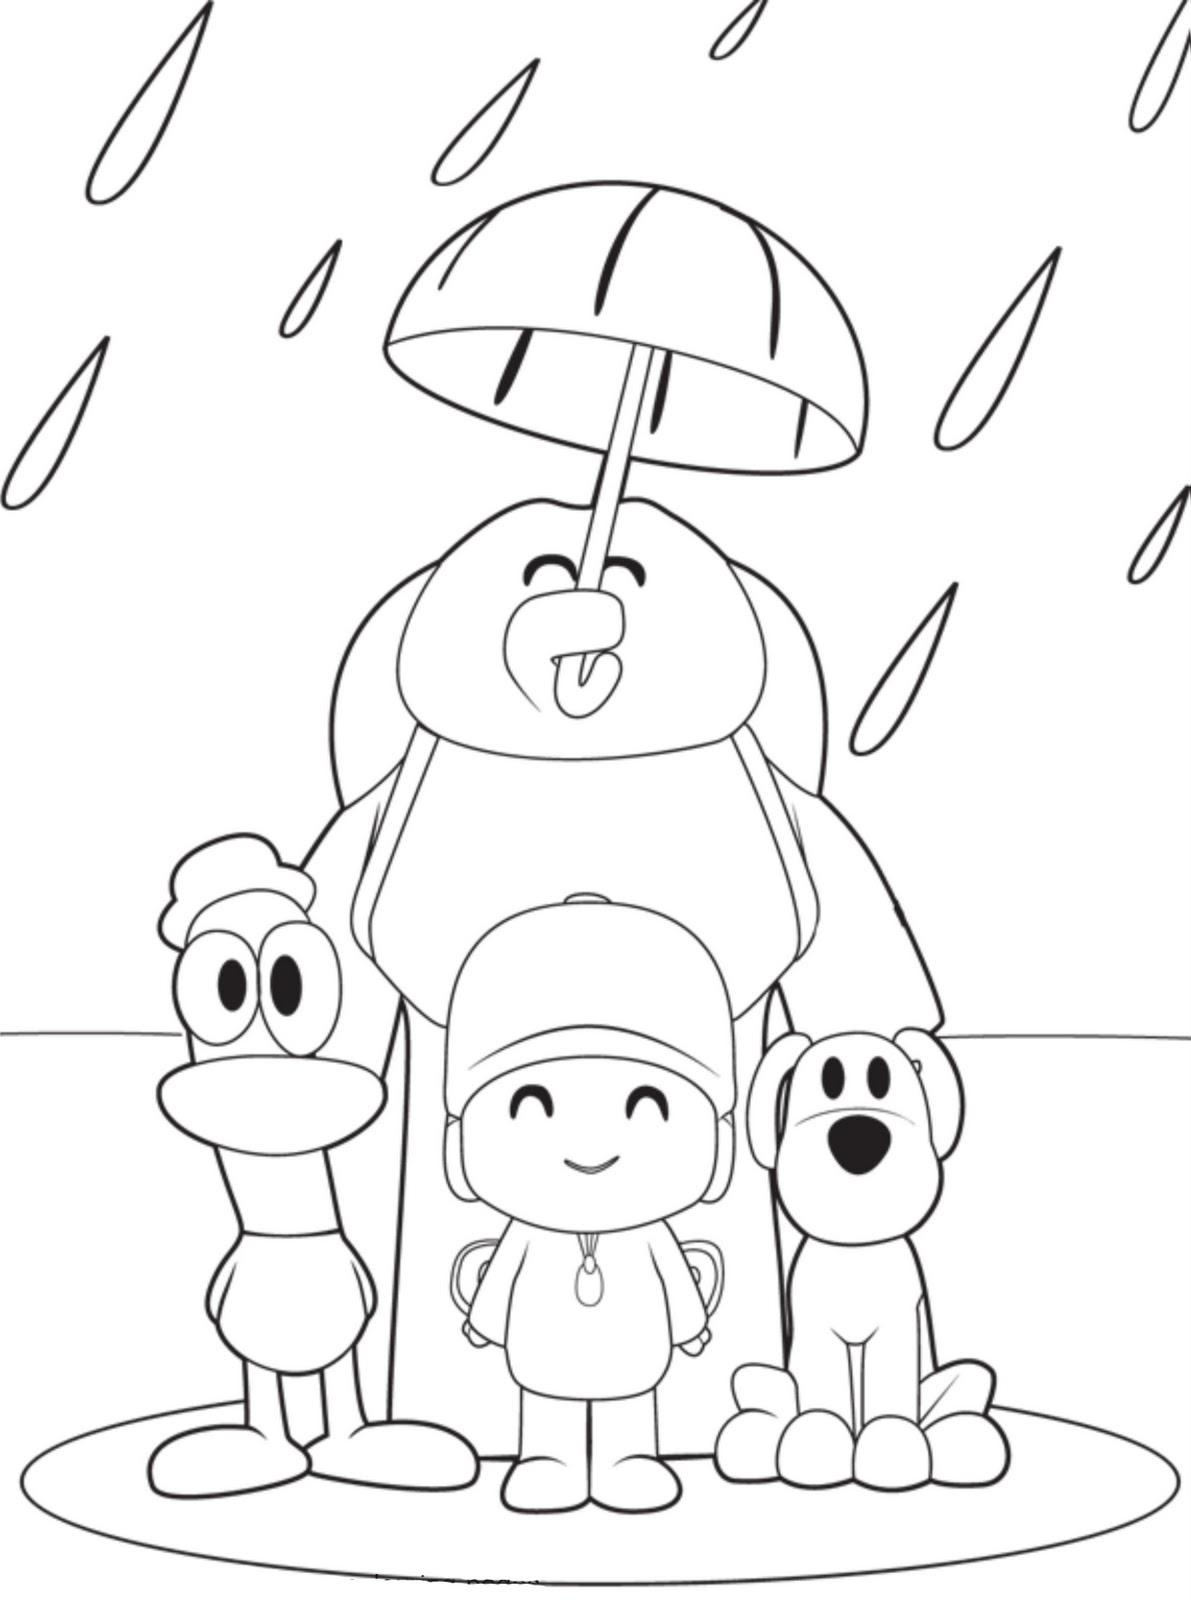 Coloriage Pocoyo et ses amis